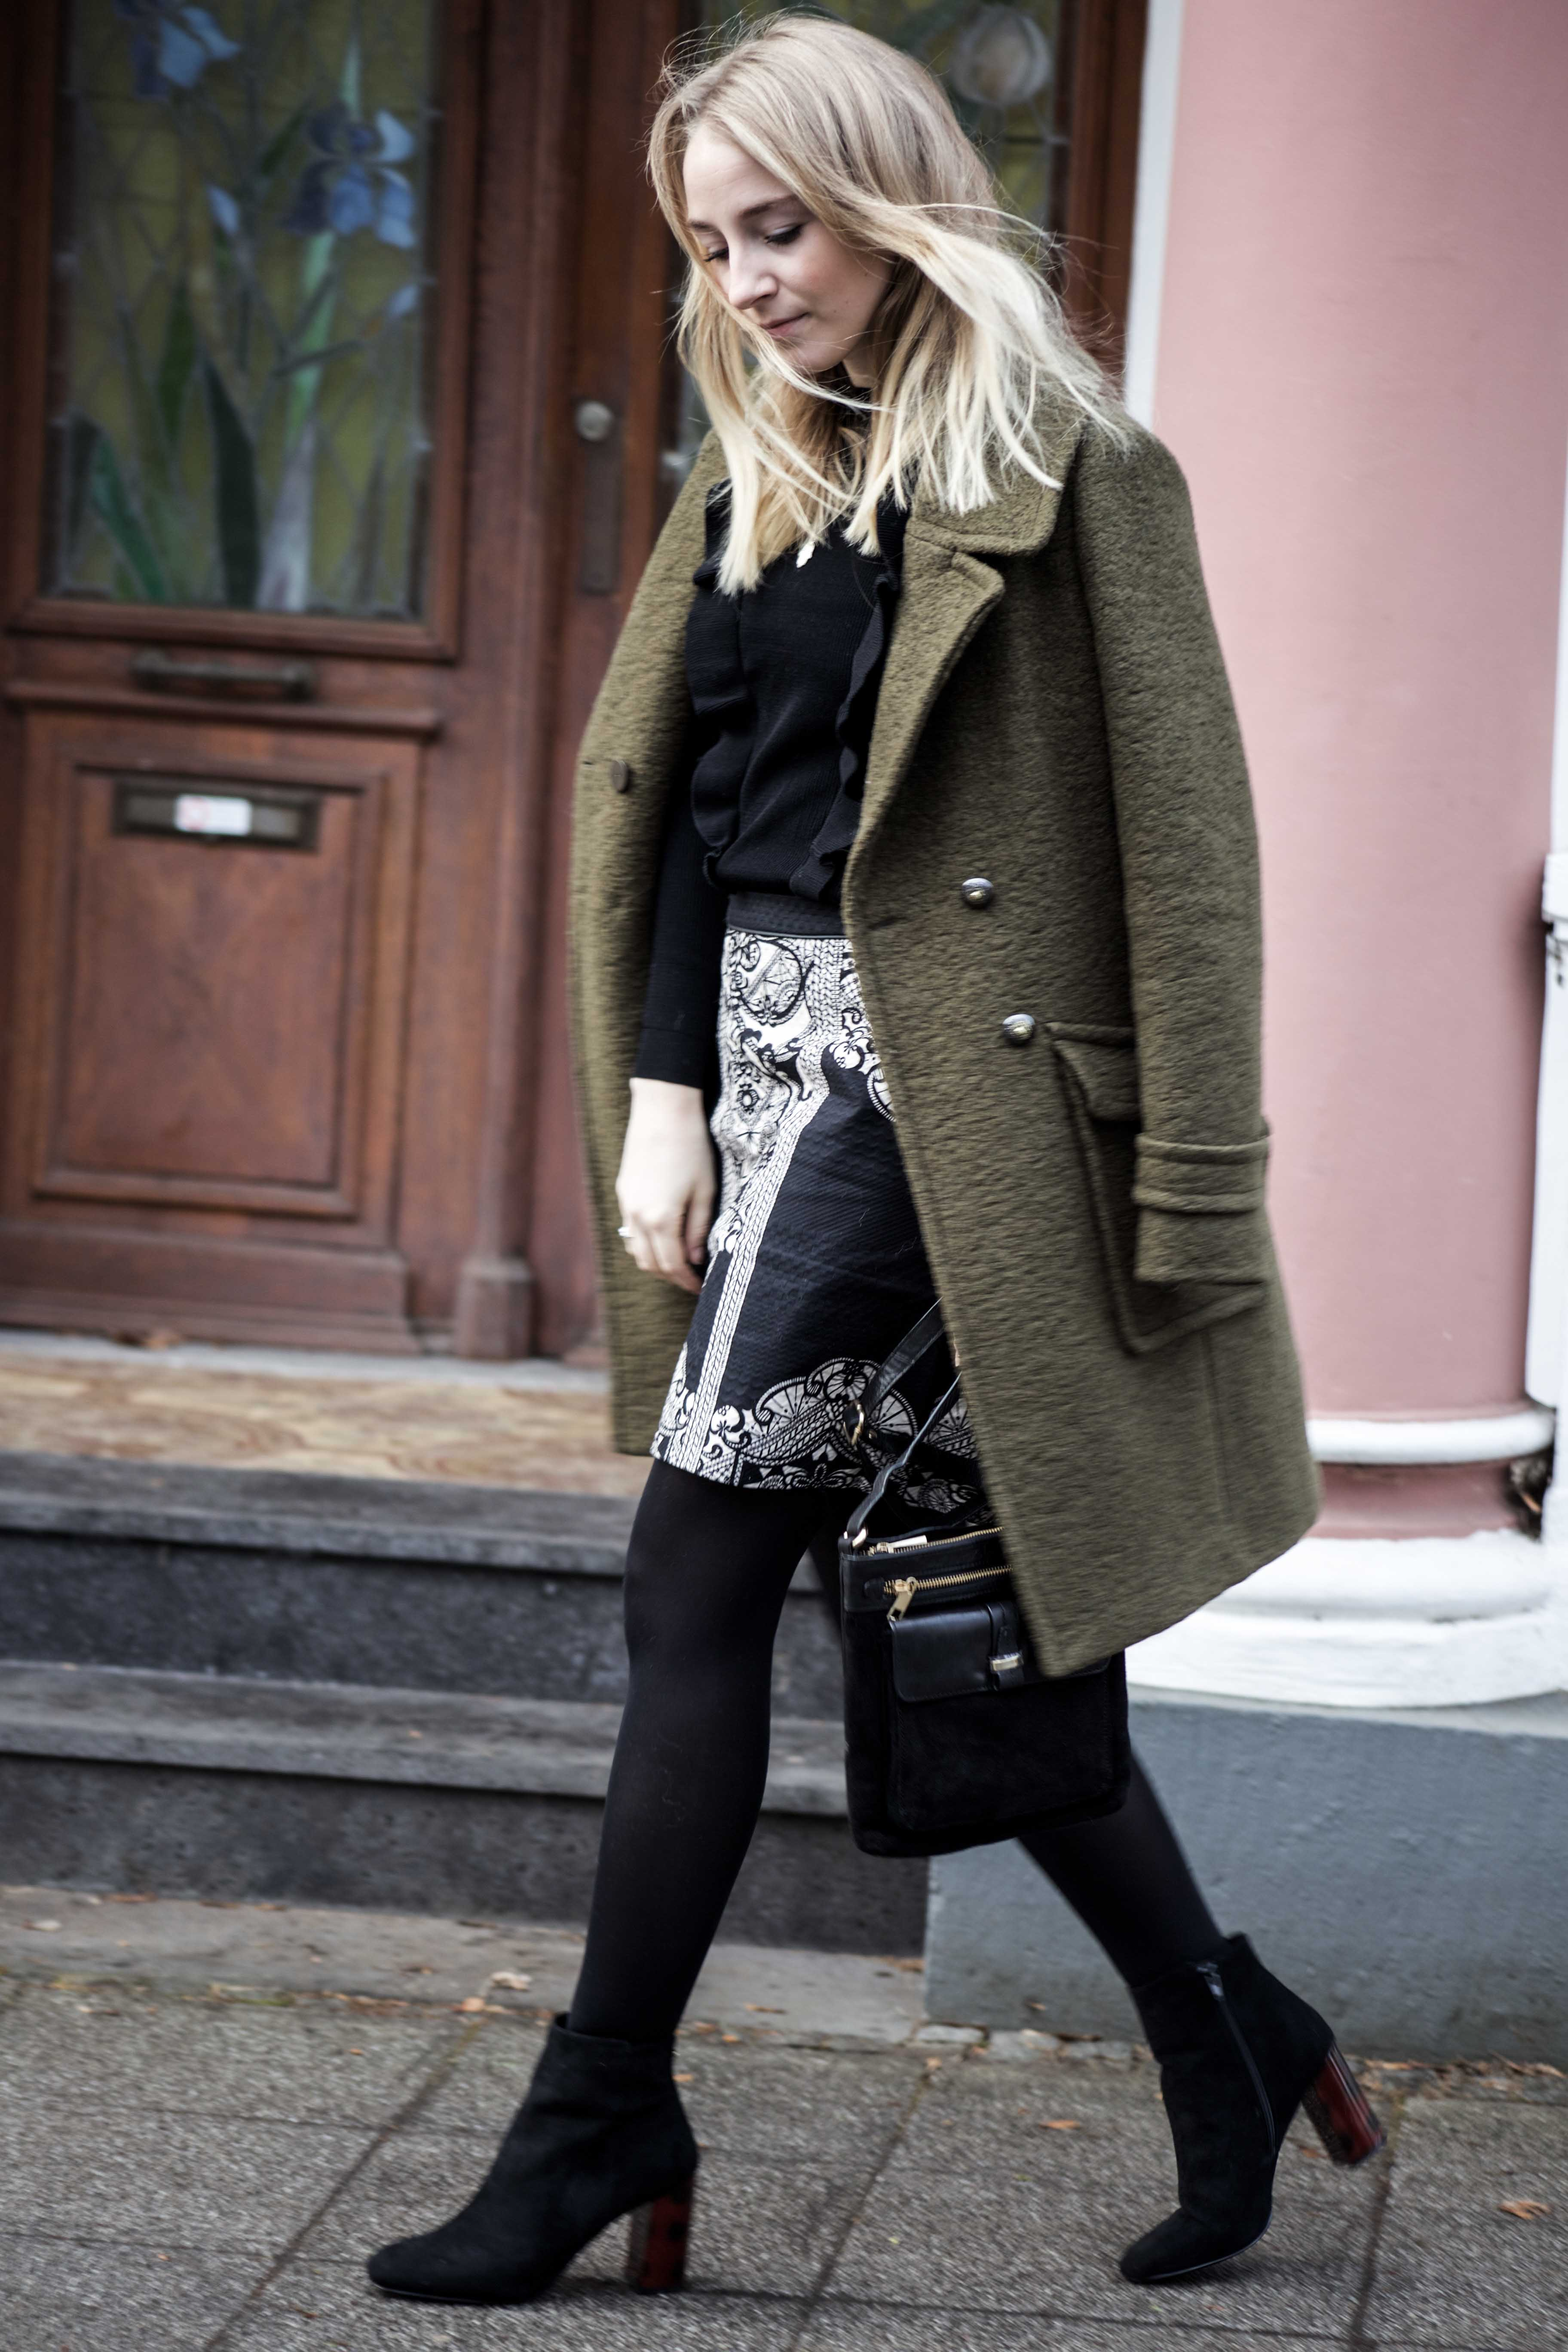 streetstyle-bonn-waldgrüner-mantel-rock-muster-print-fashionblogger-modeblog-mode-outfit_0089